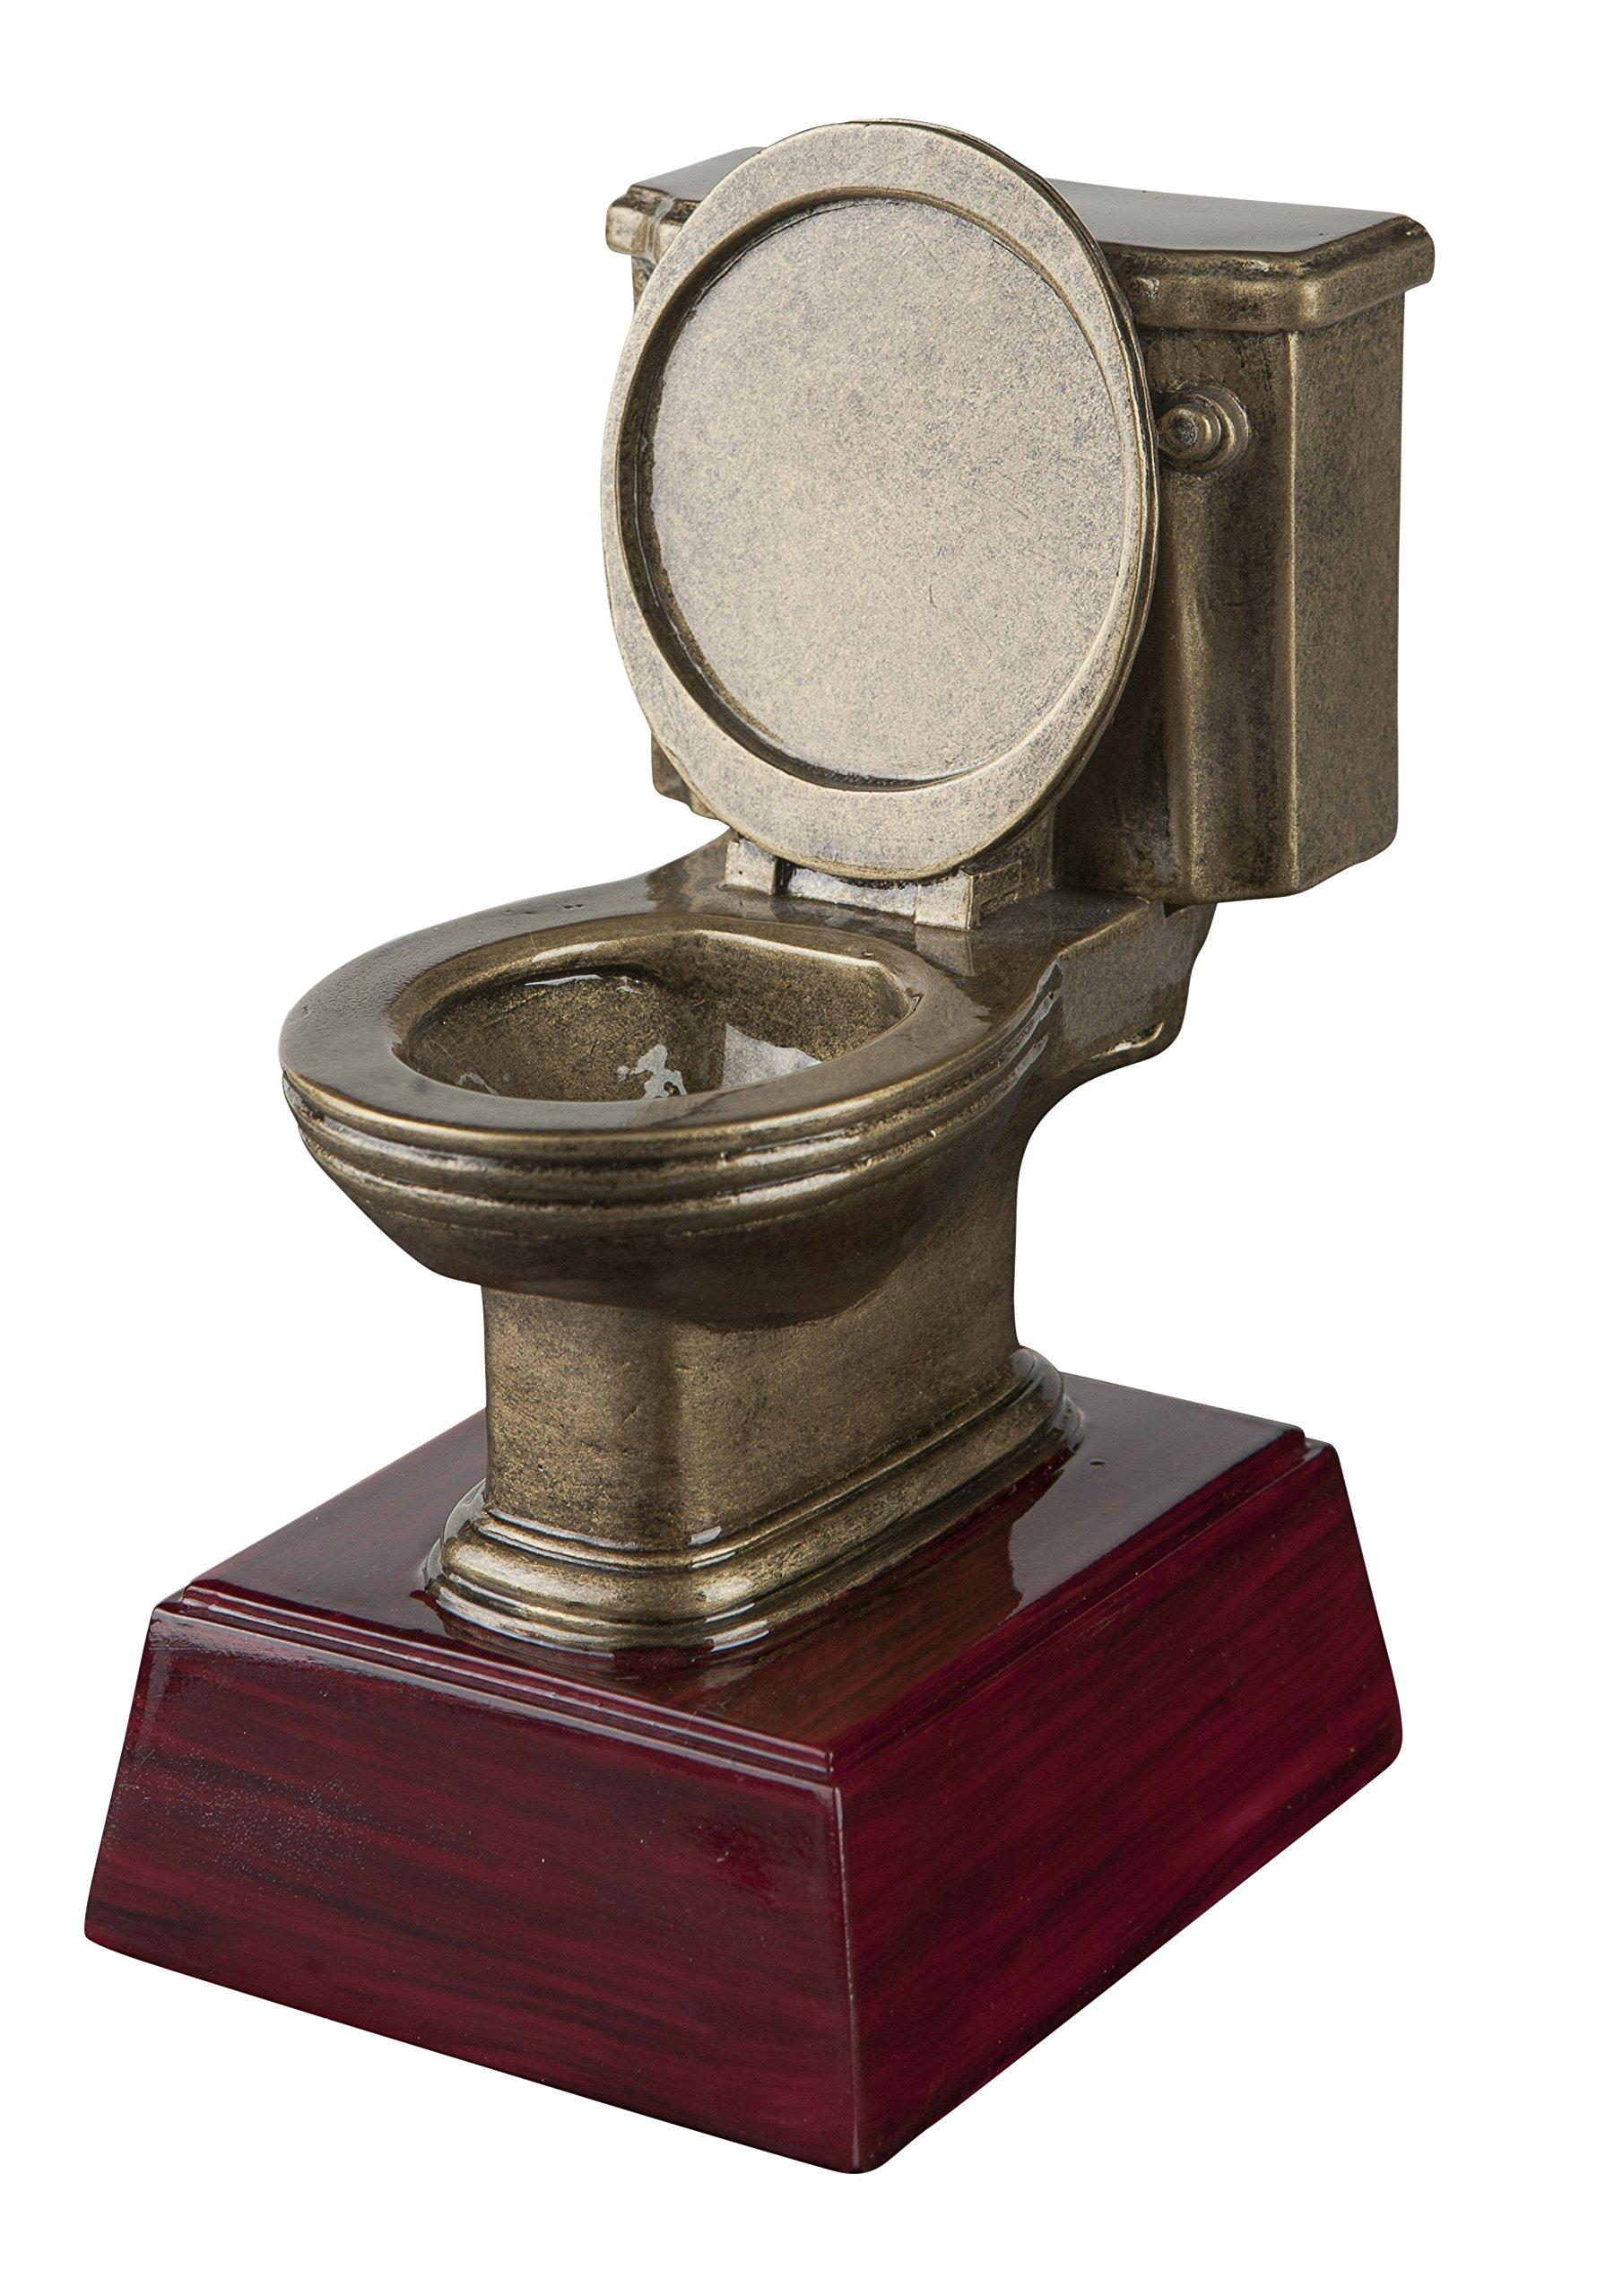 Gold Toilet Bowl Trophy/Potty Training Award/Last Place Award/FFL Loser Trophy | 6 Inch - Decade Awards